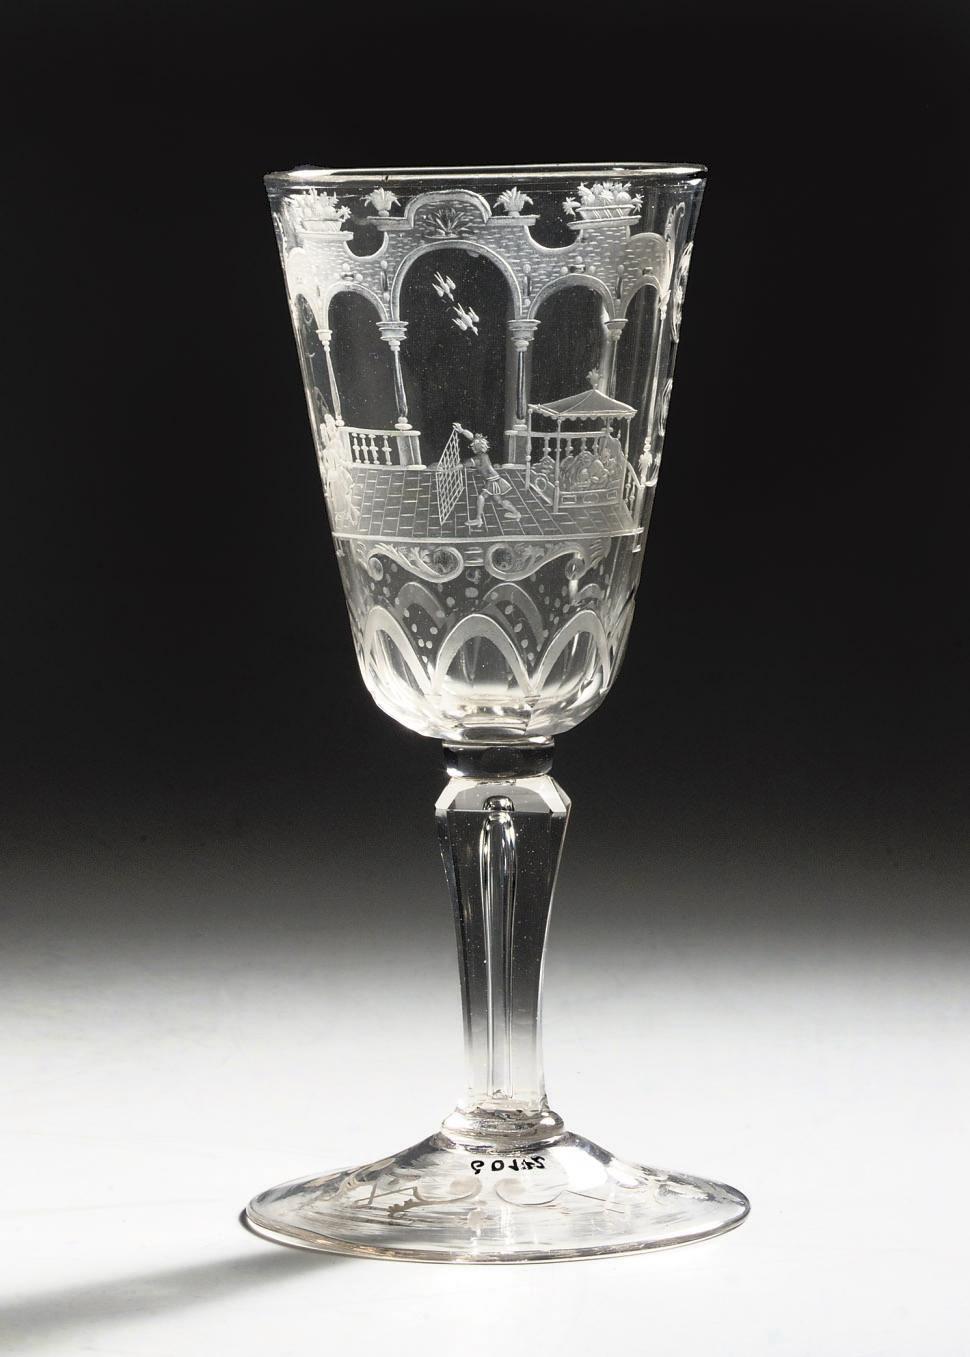 An engraved goblet